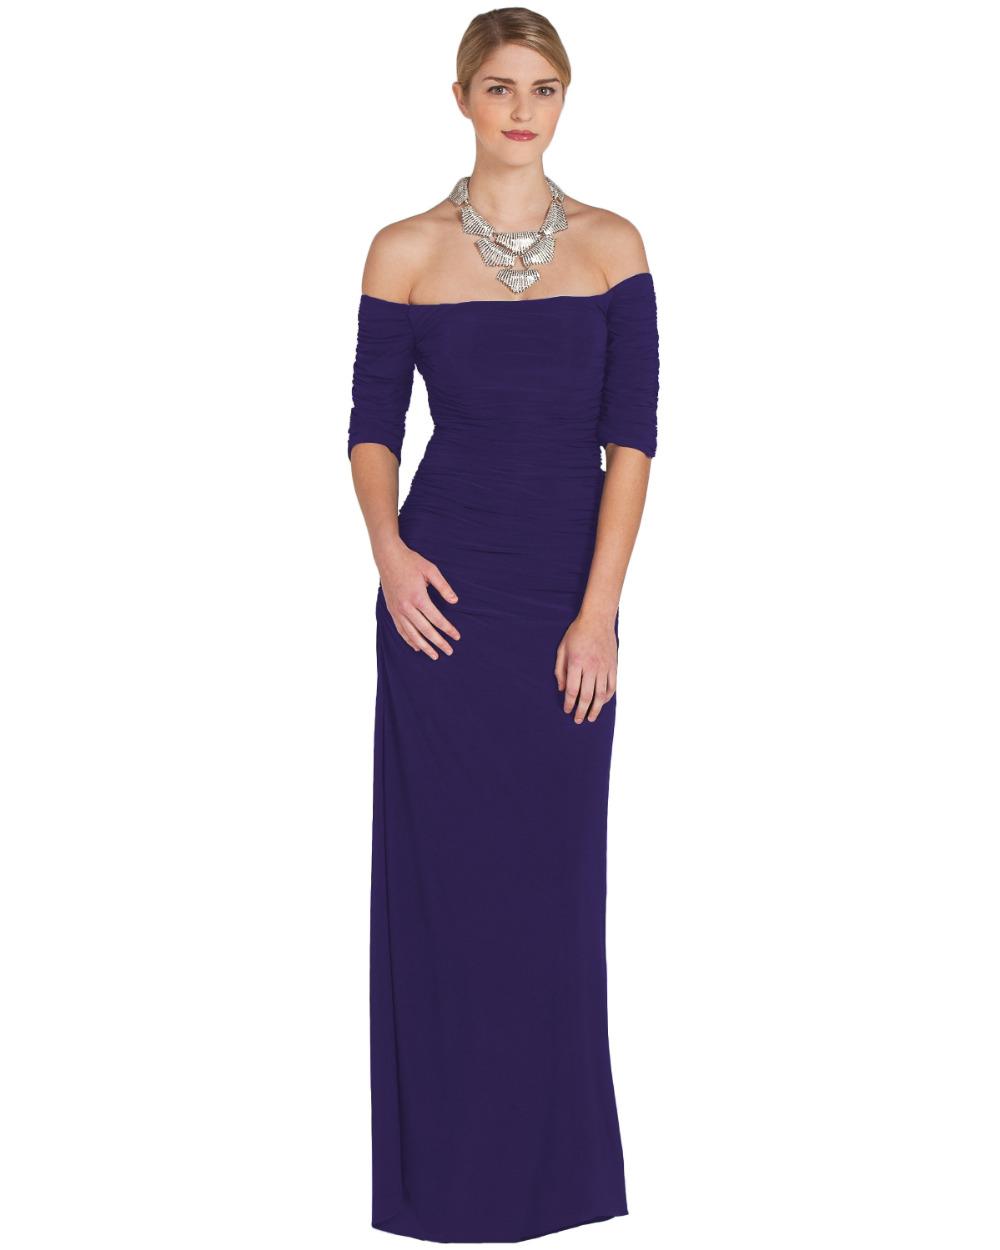 Navy blue long evening dress 2015 boat neck short sleeve for Navy evening dresses for weddings